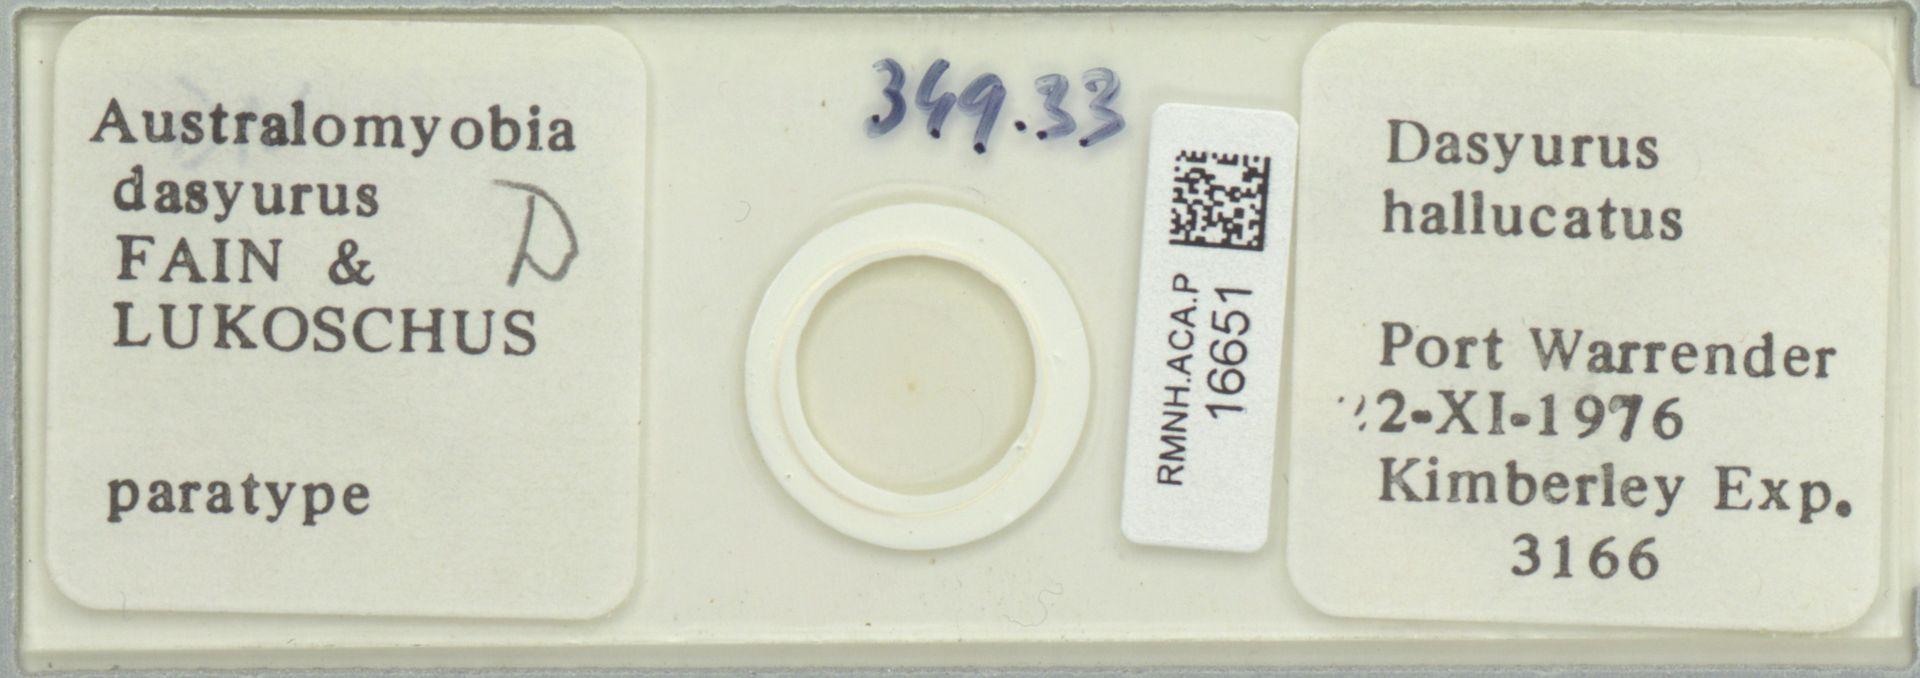 RMNH.ACA.P.16651 | Australomyobia dasyurus